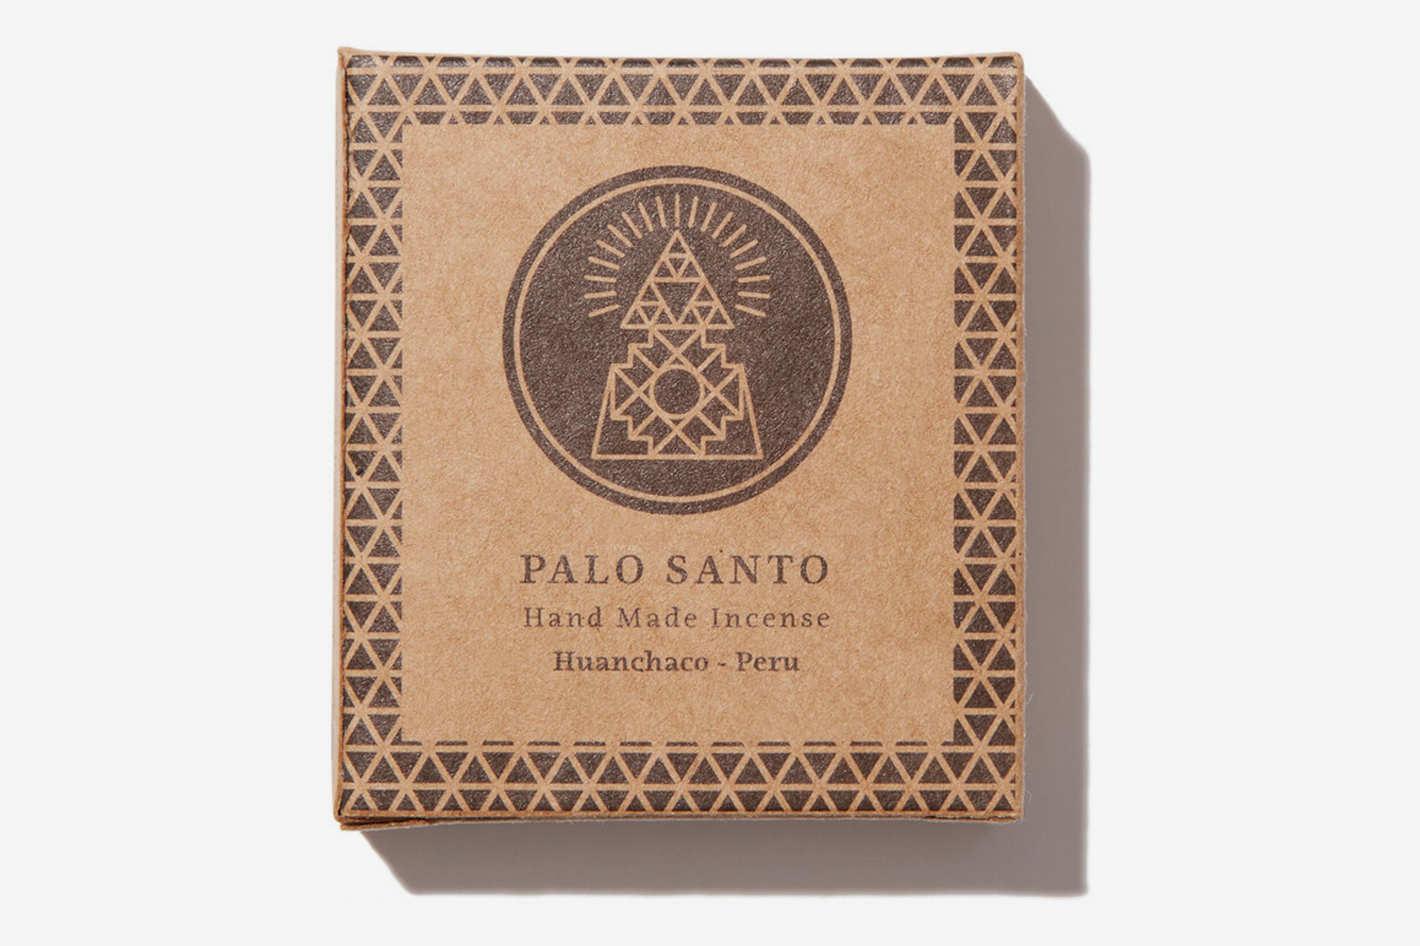 Palo Santo Wood Hand-Pressed Incense